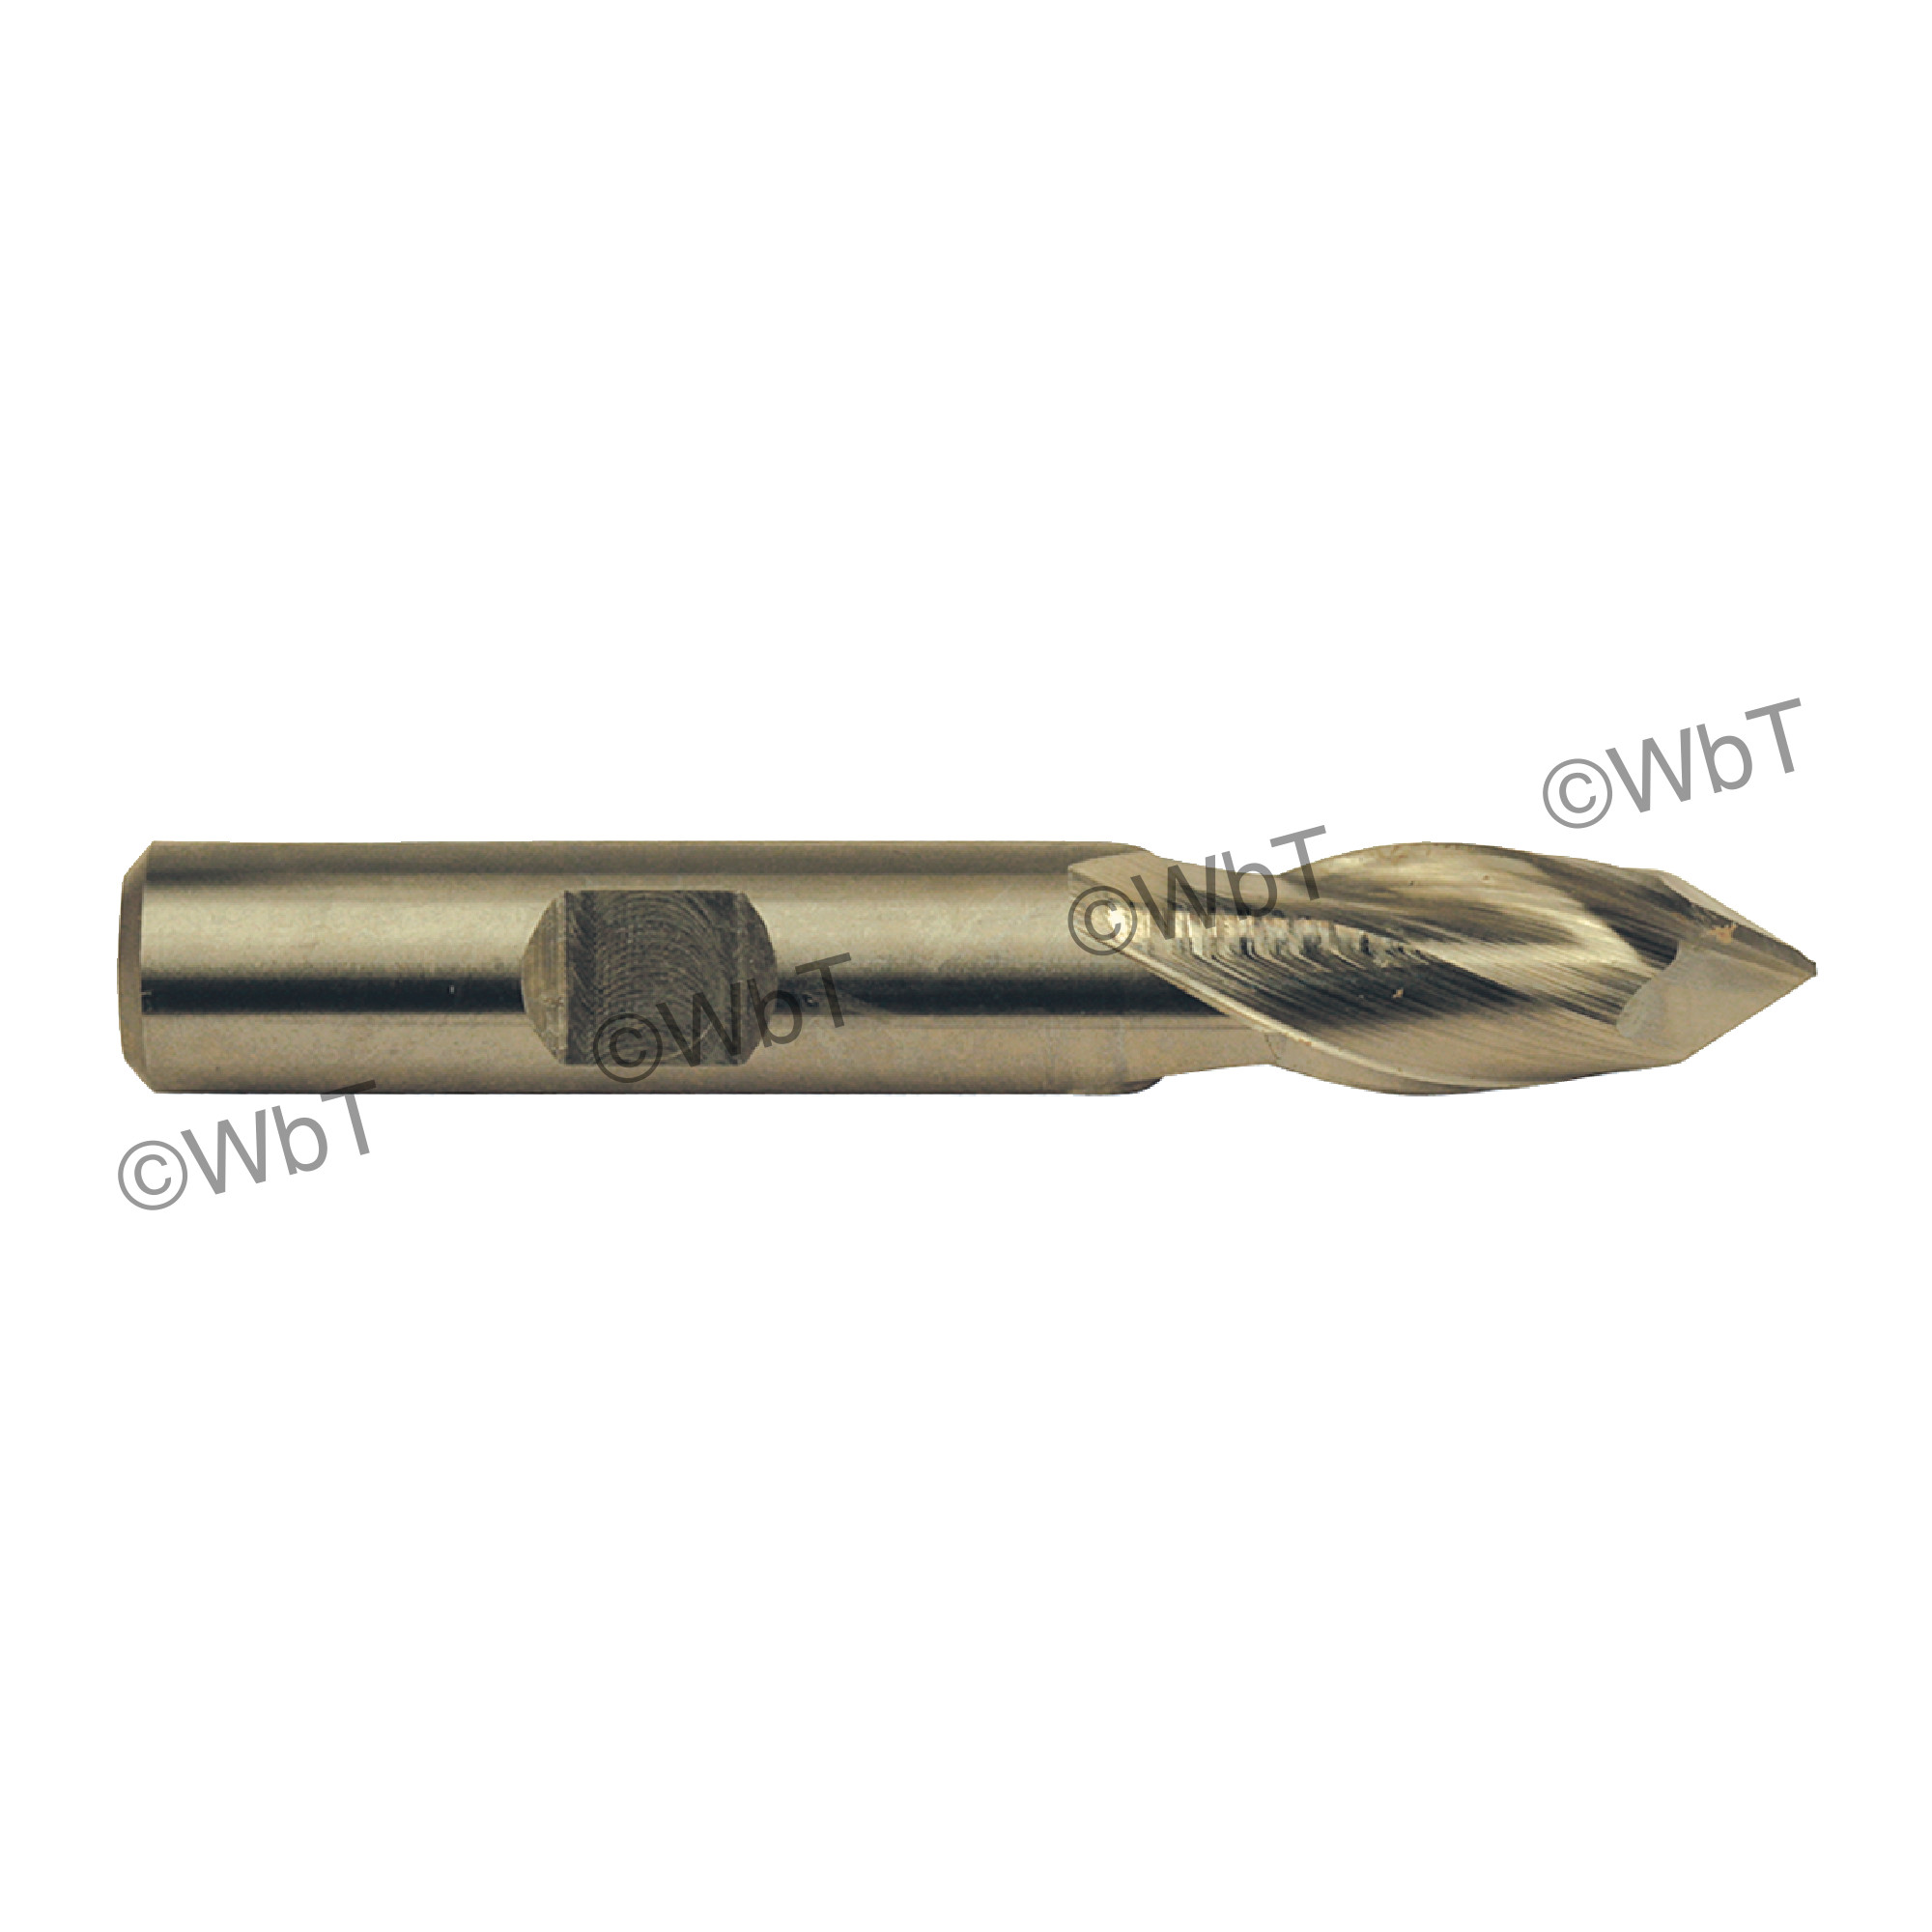 "1/2"" x 90° Cobalt 2 Flute Drill-Mill Single End Mill"